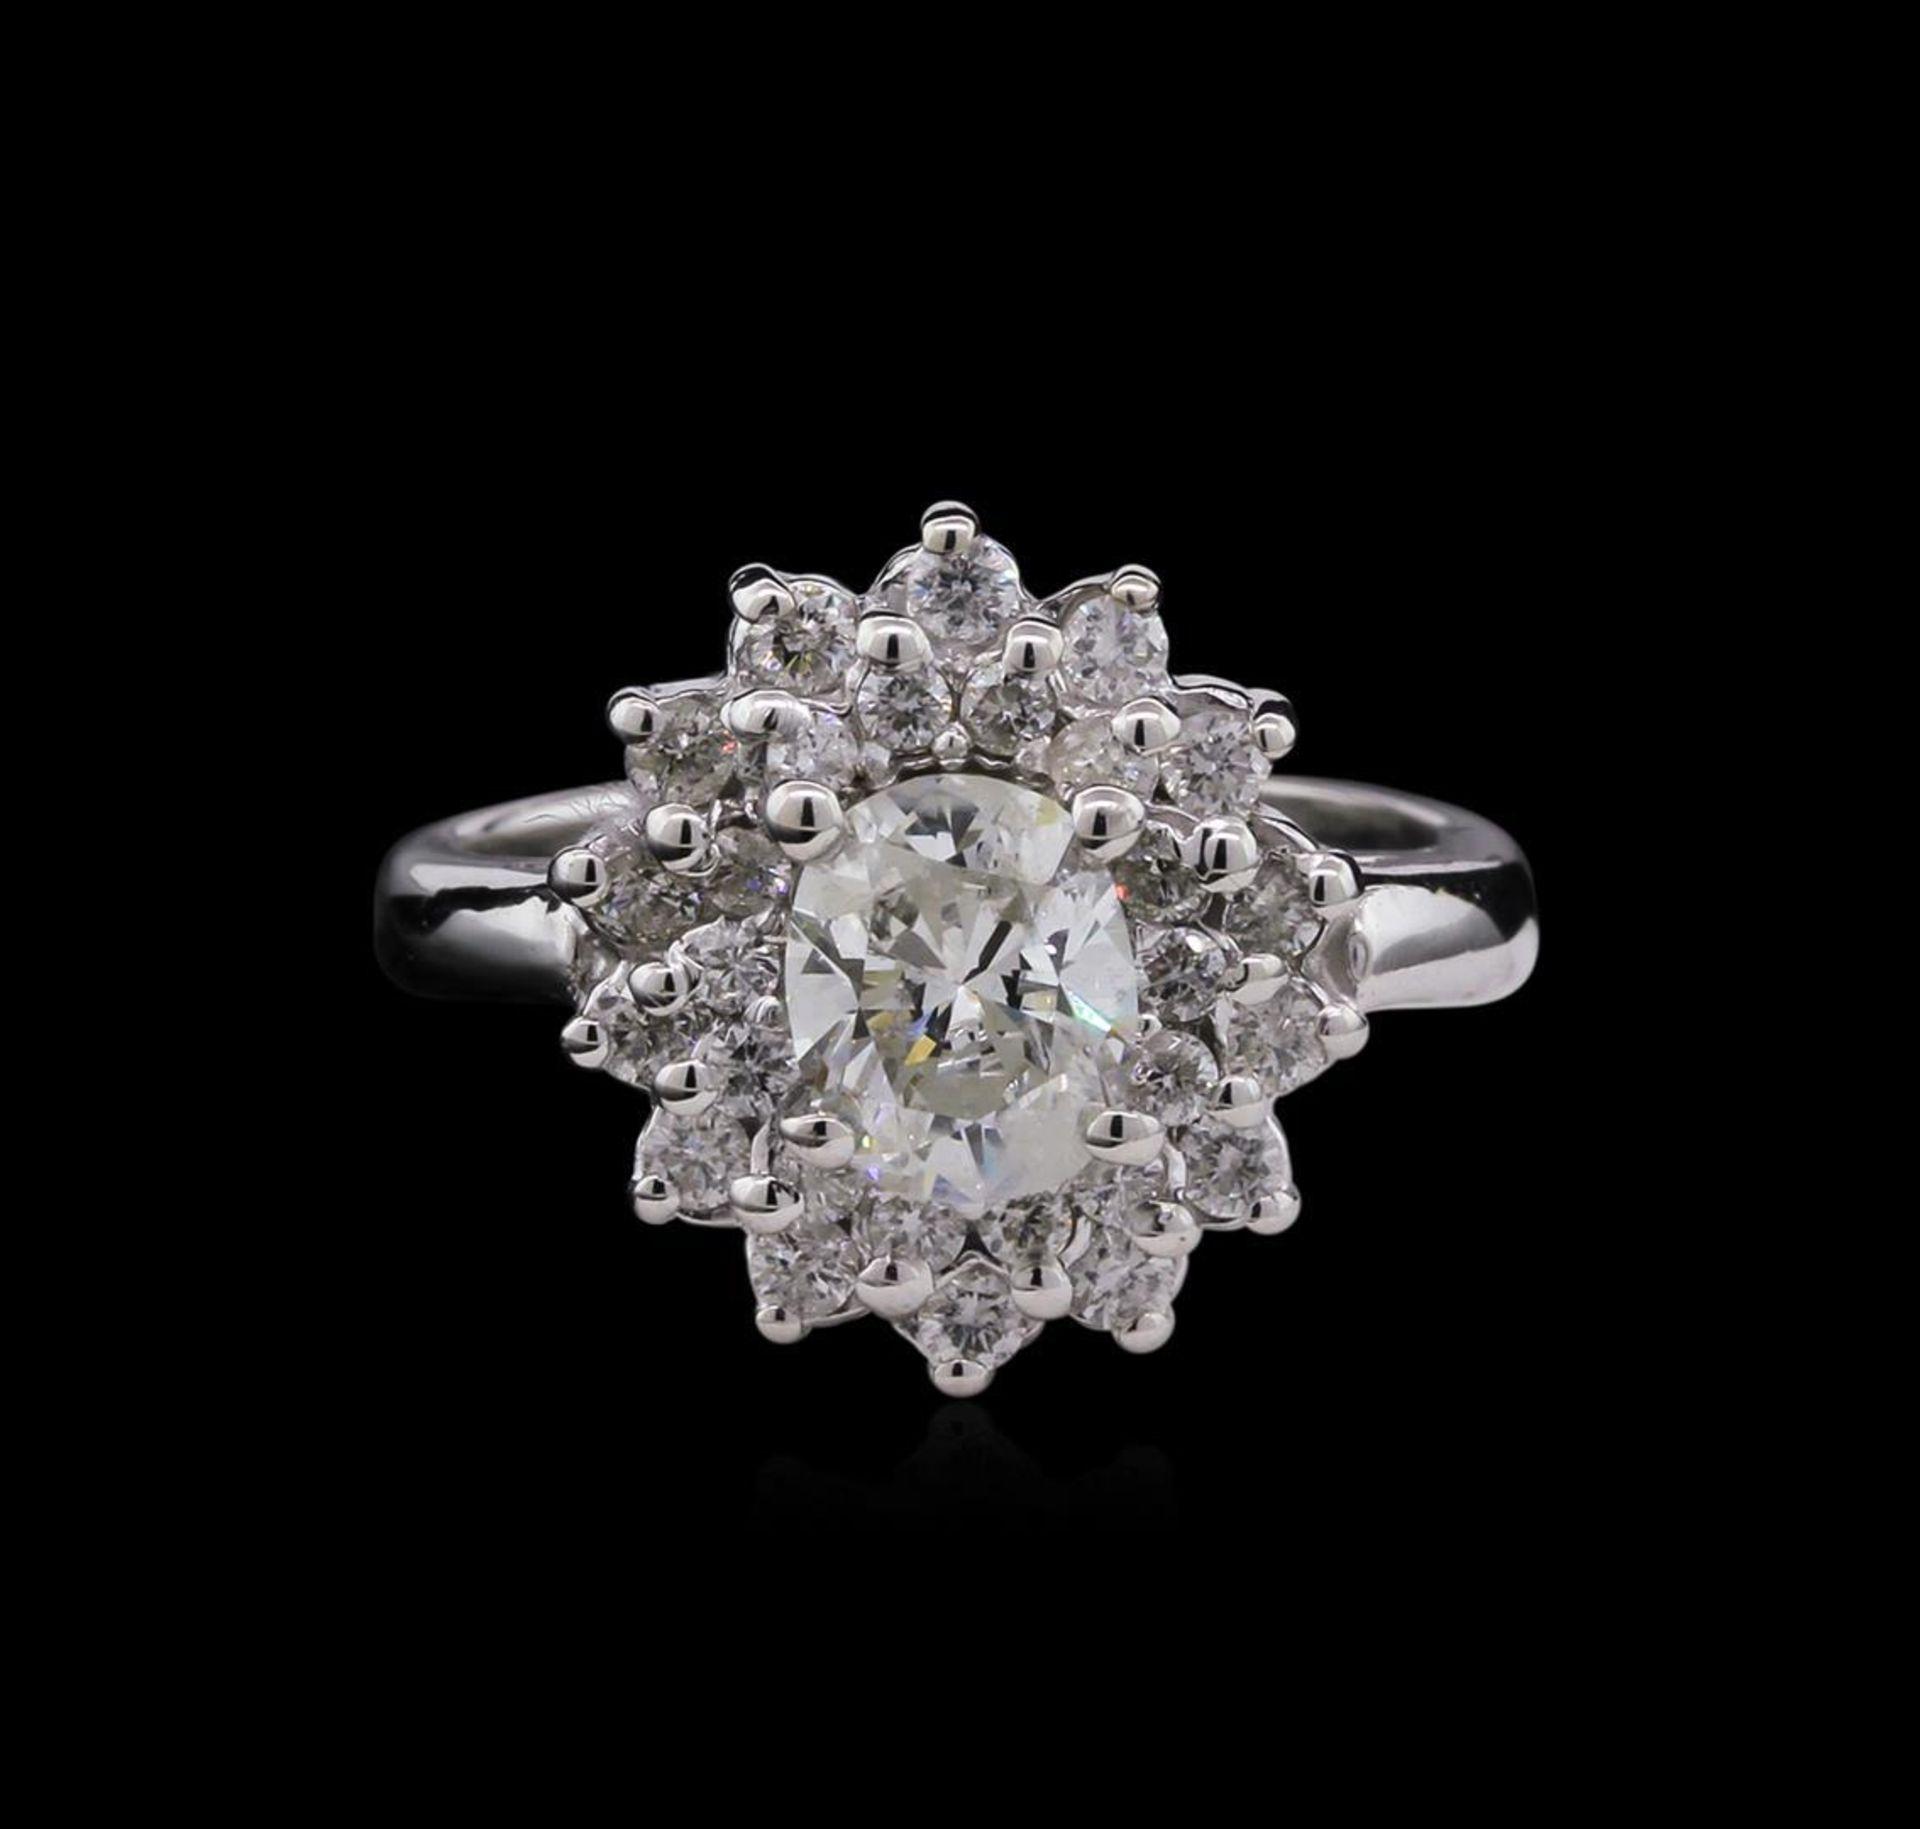 1.59 ctw Diamond Ring - 14KT White Gold - Image 2 of 3